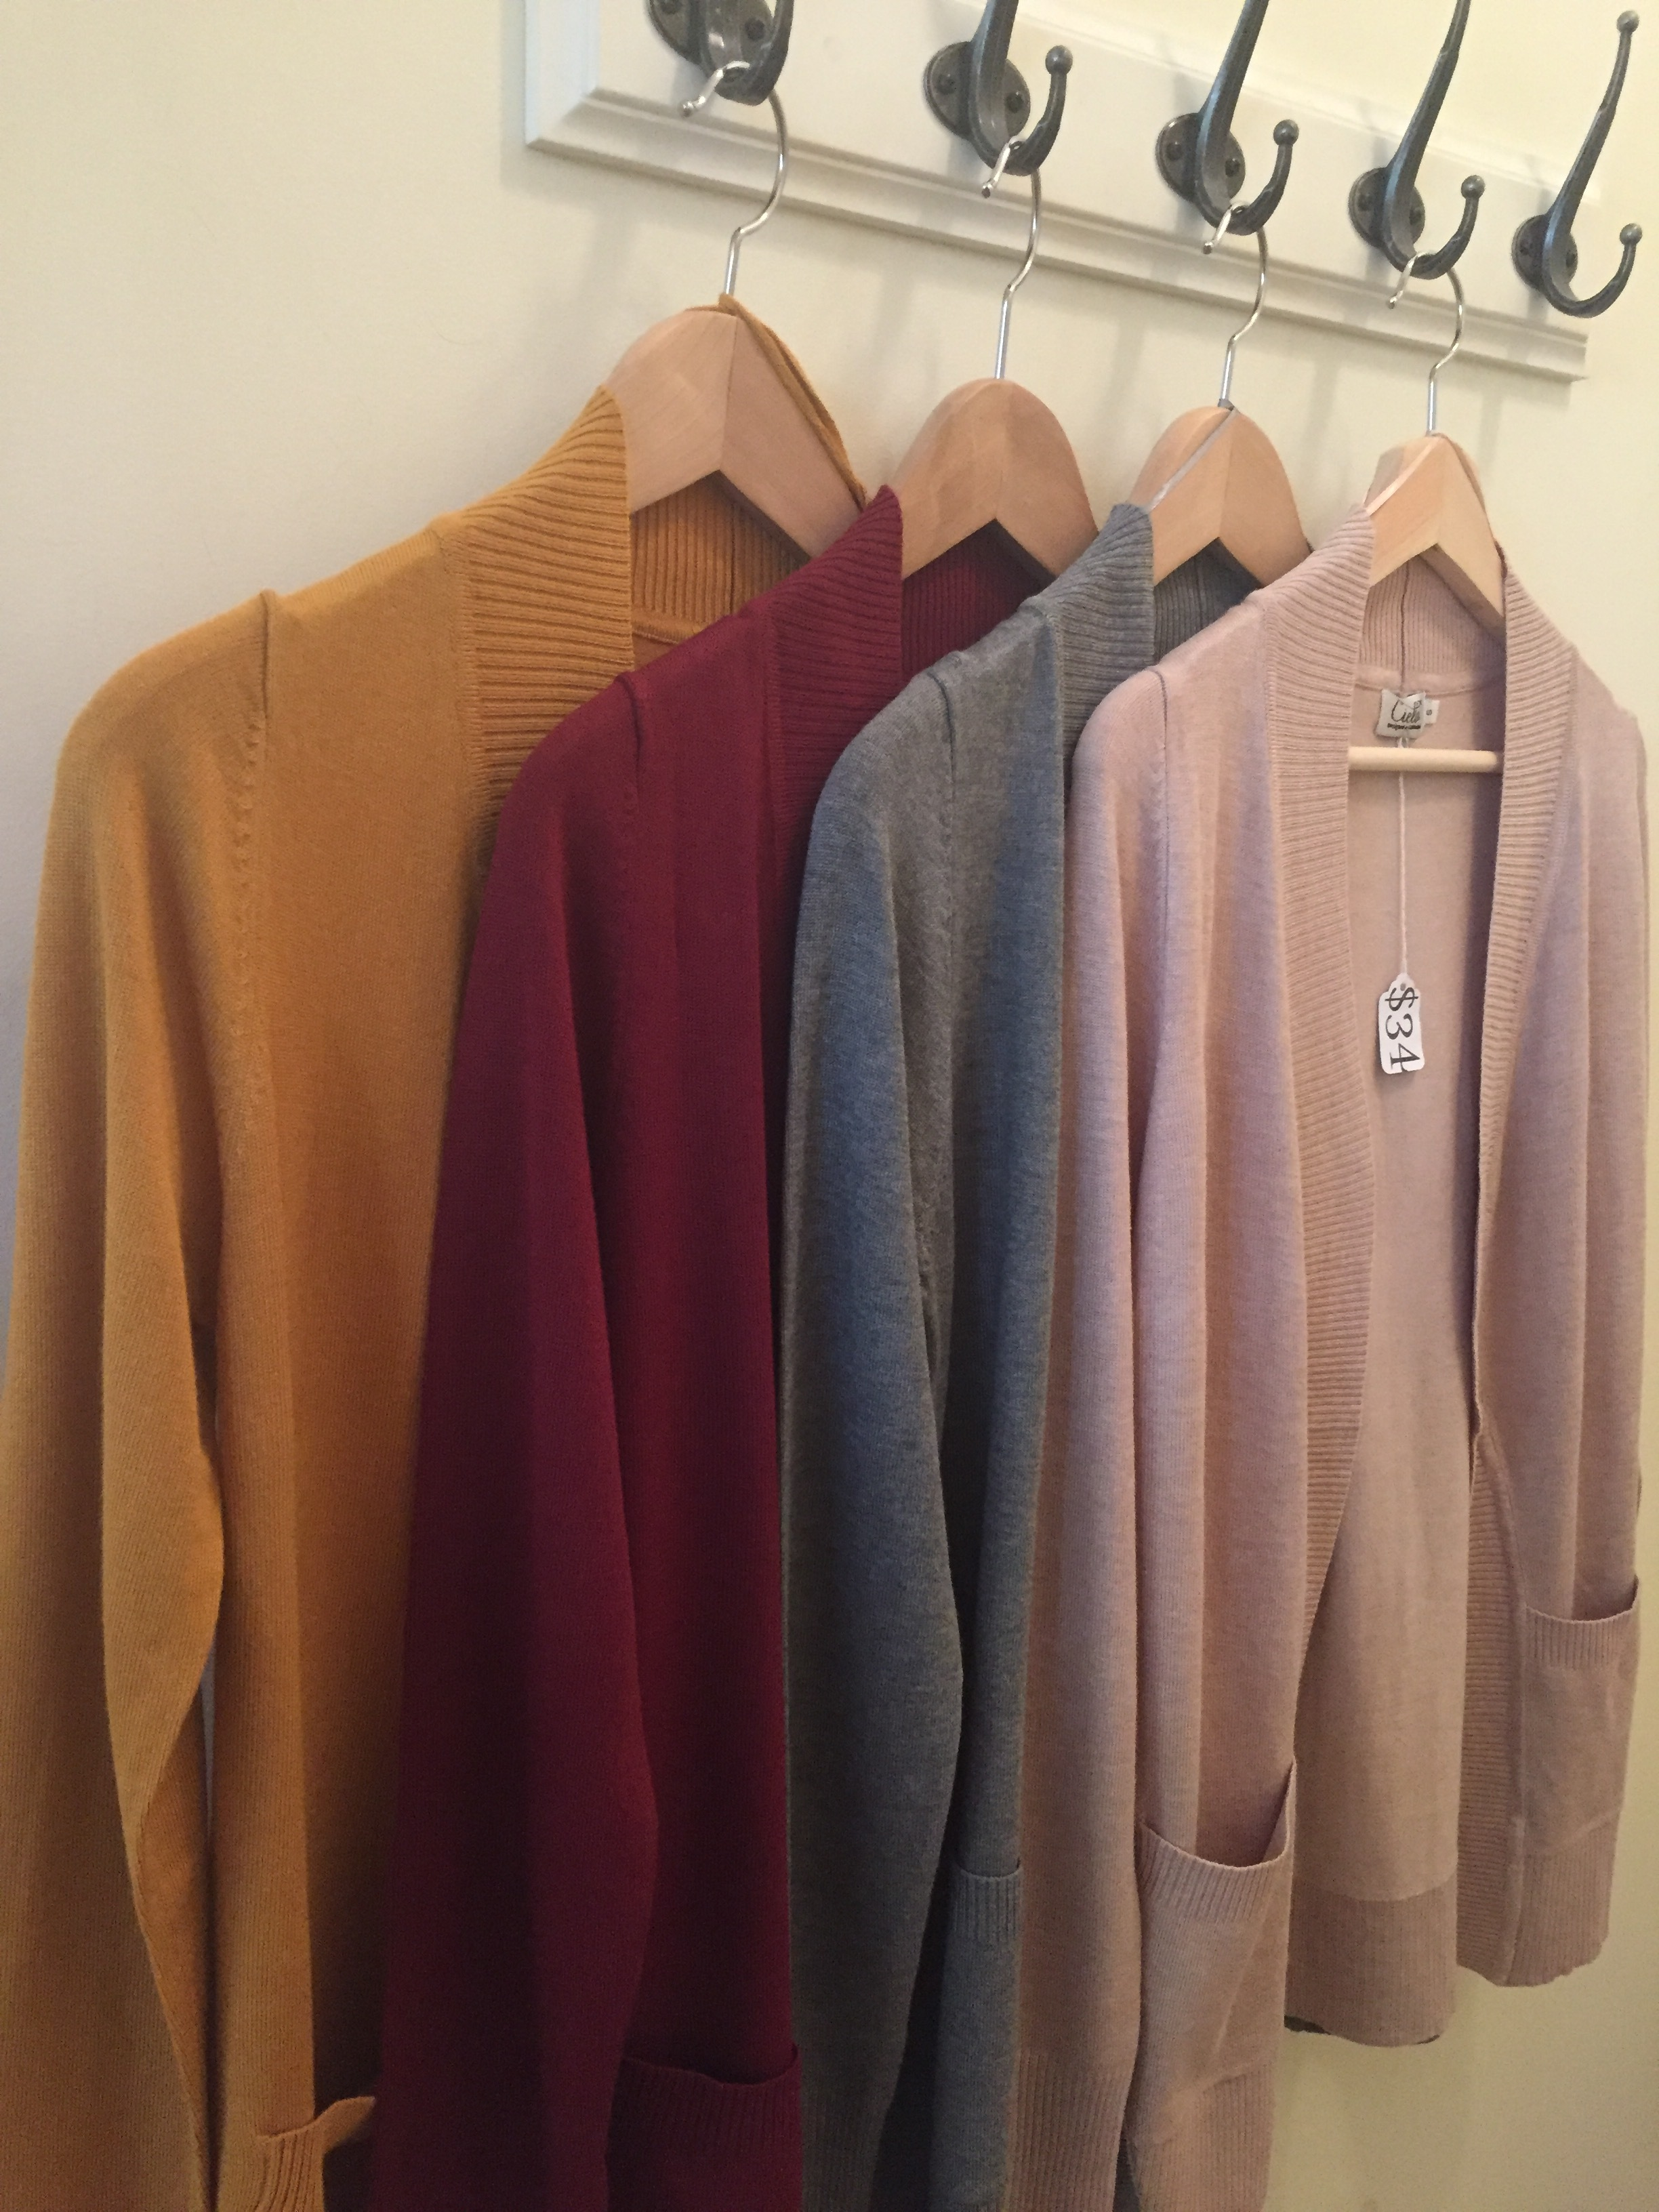 Ceilo open front cardigan ($34, various colors)